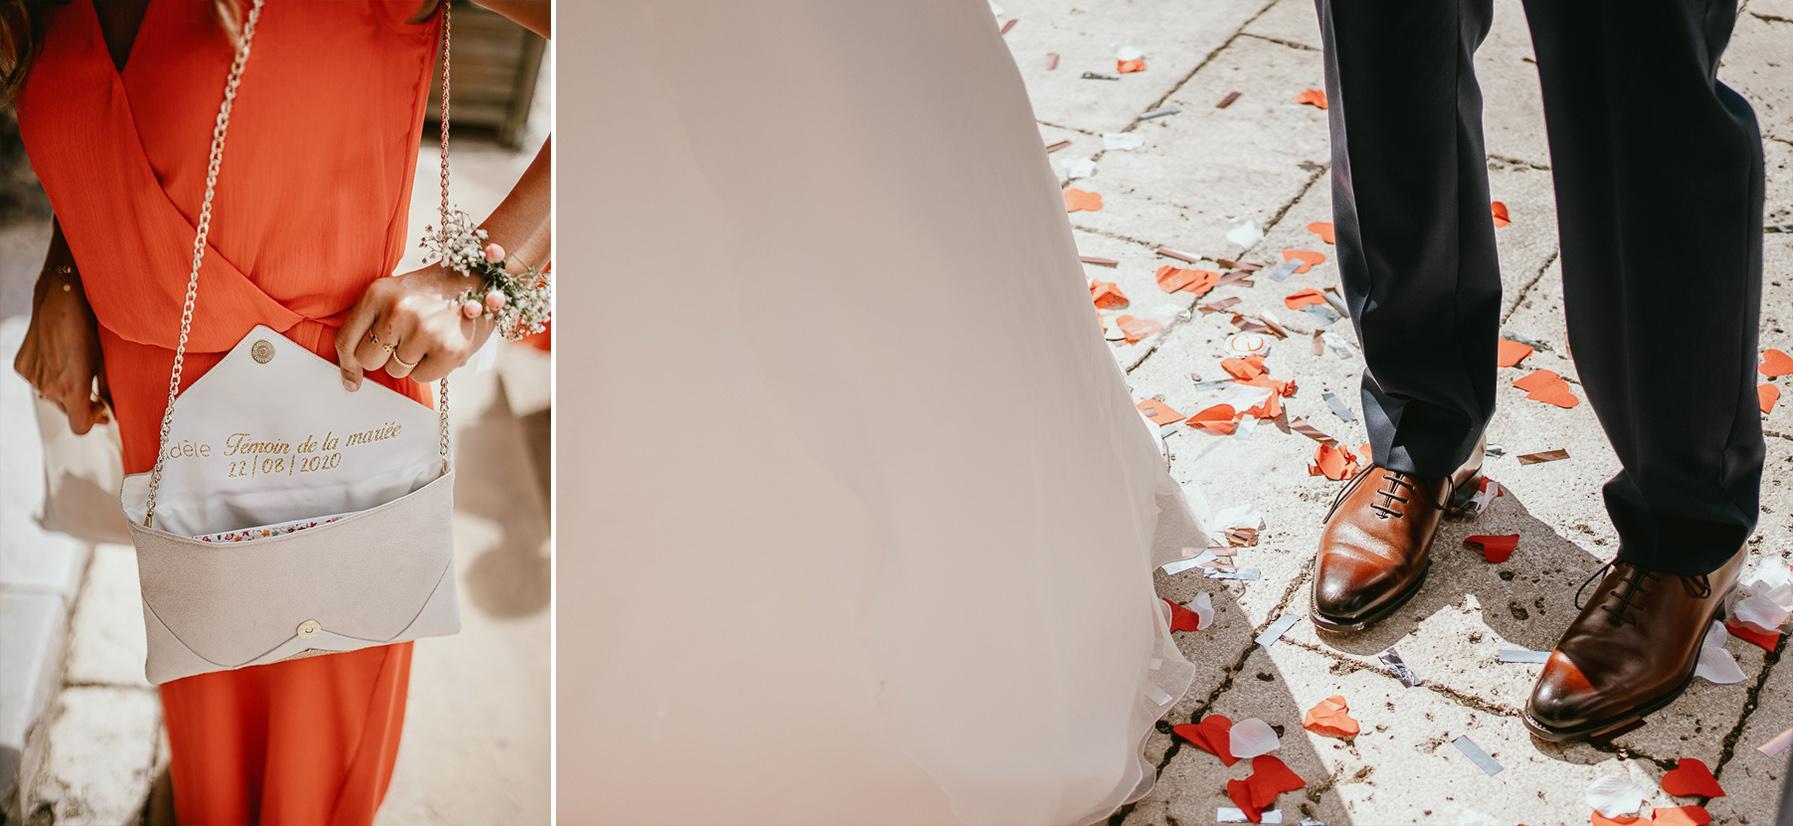 Mariage landes photographe eglise details